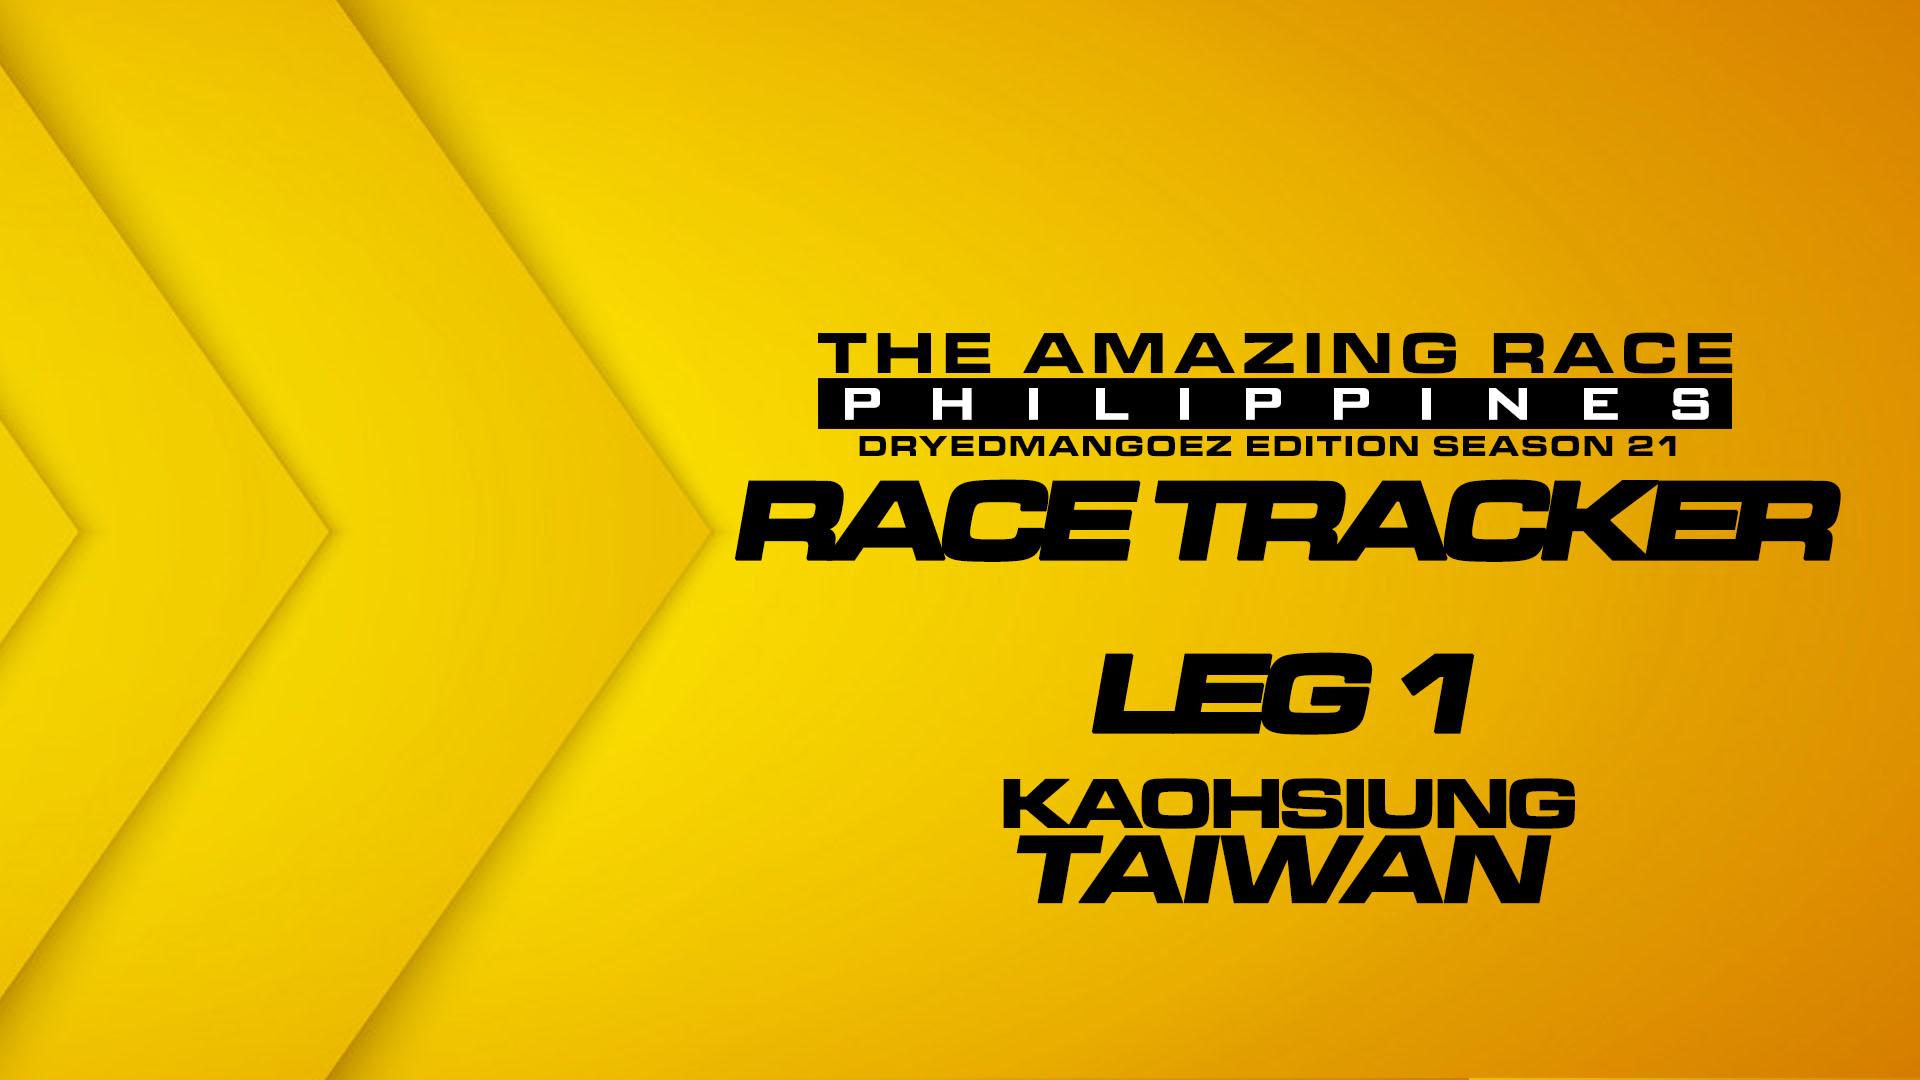 The Amazing Race Philippines: DryedMangoez Edition Season 21 Race Tracker – Leg 1